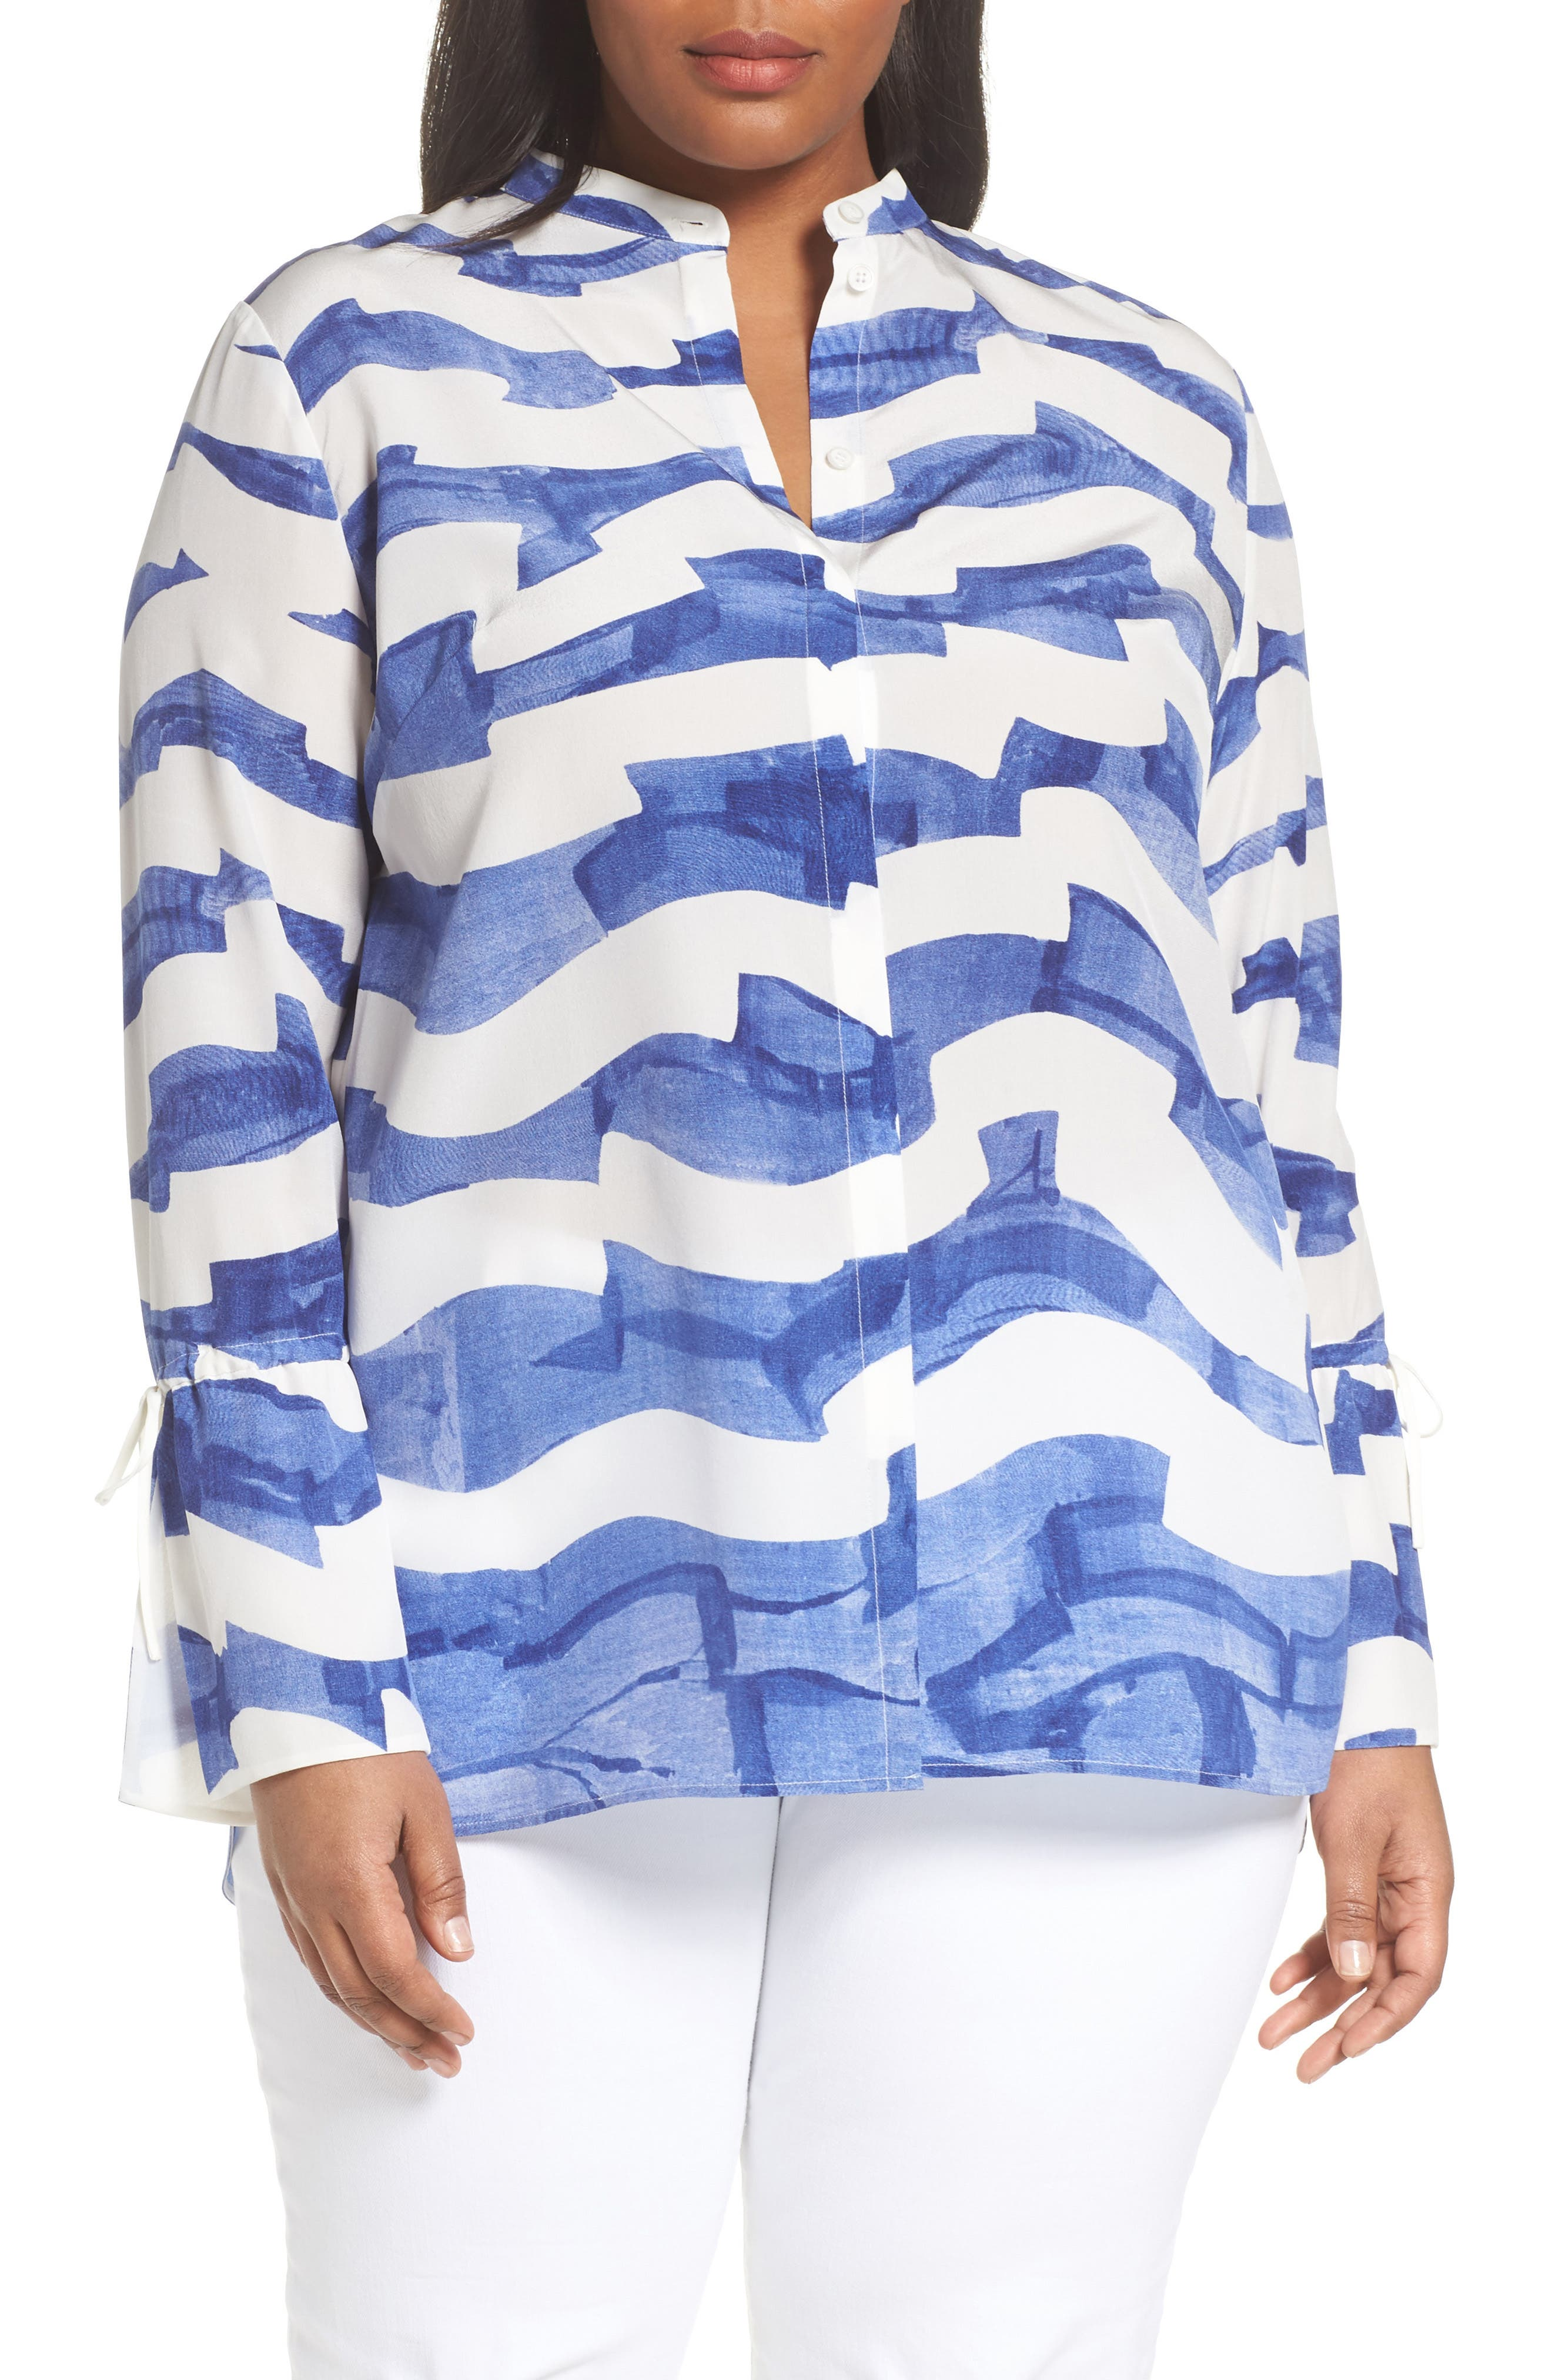 Desra Silk Blouse,                         Main,                         color,